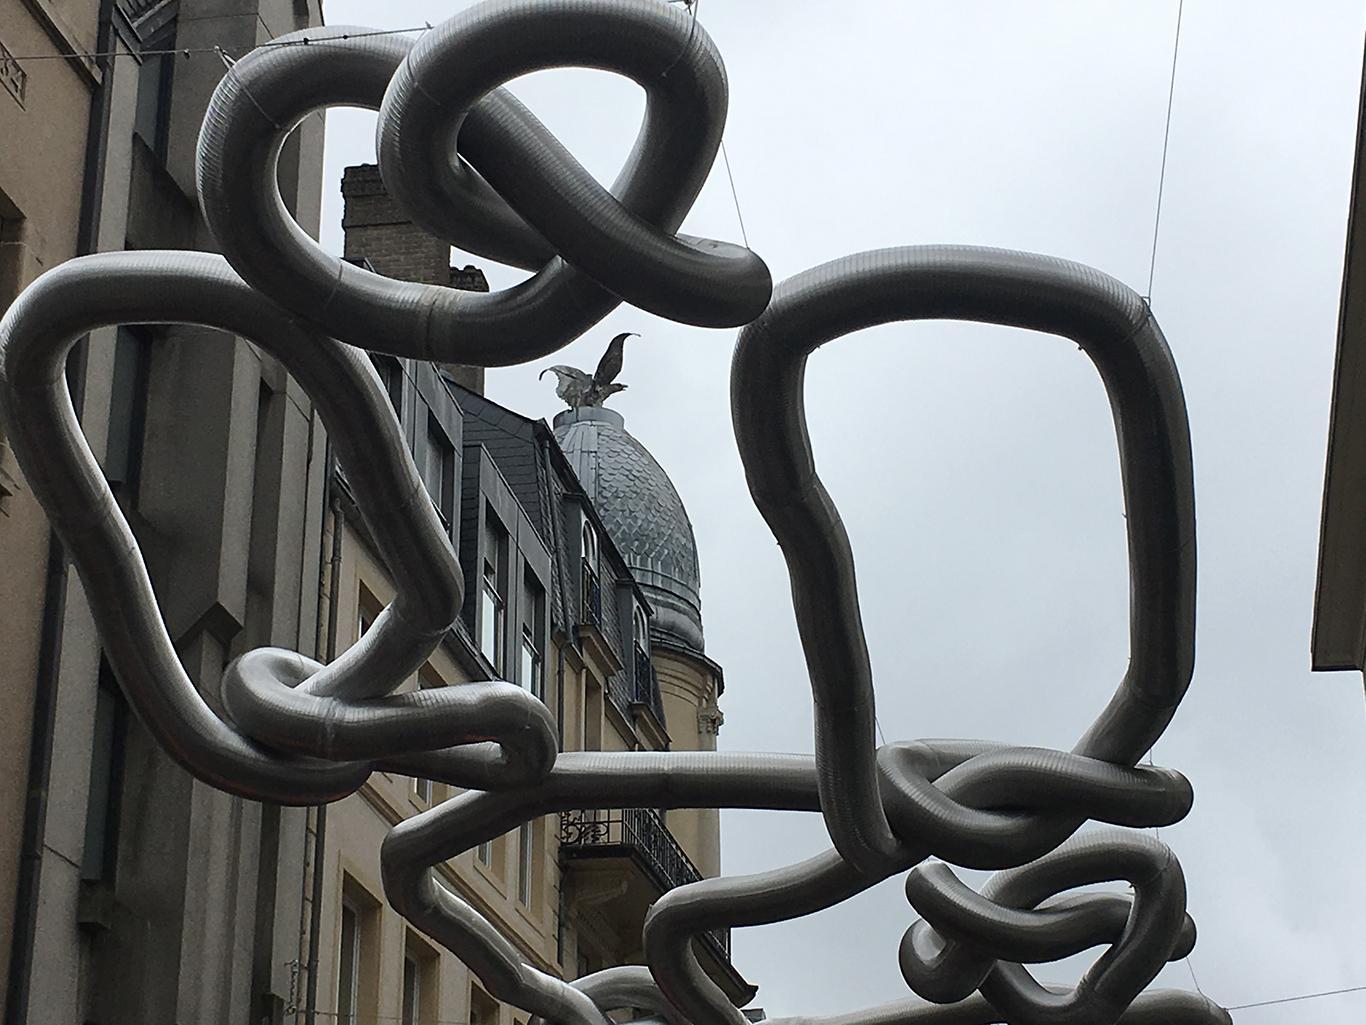 Citysafari Luxemburg Enorme adelaar op het dak